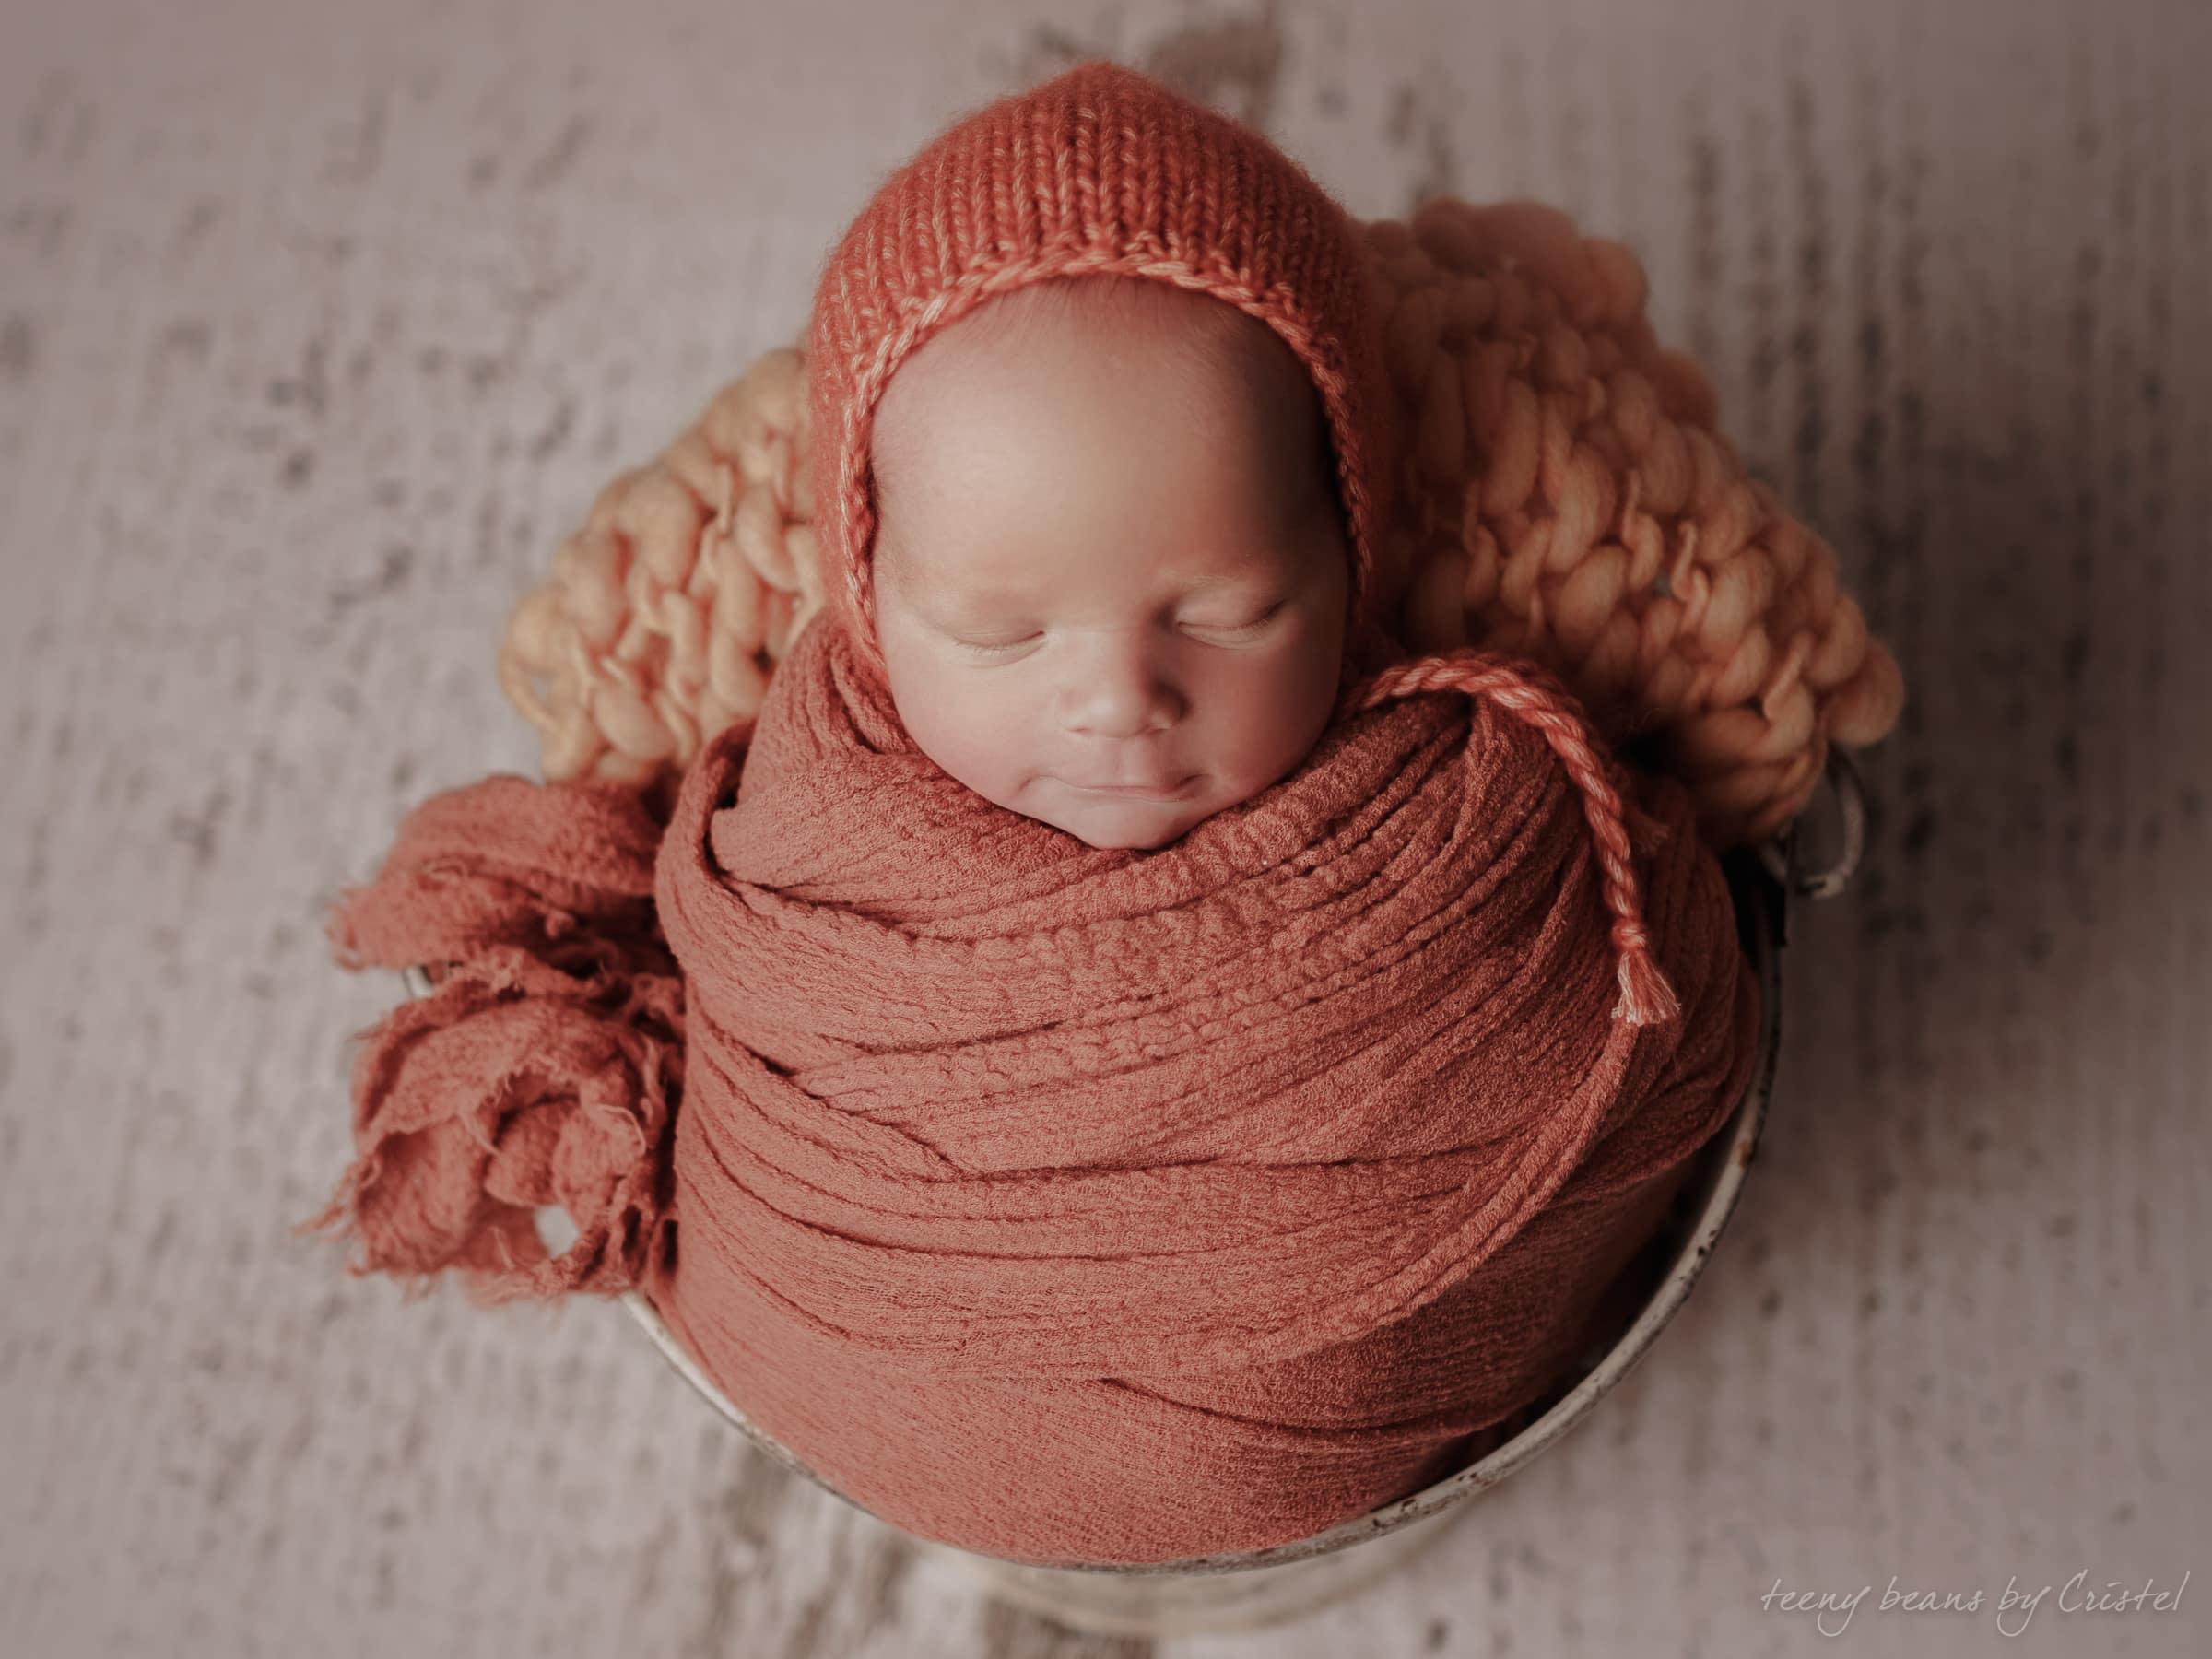 raleigh baby photographer – baby kellin